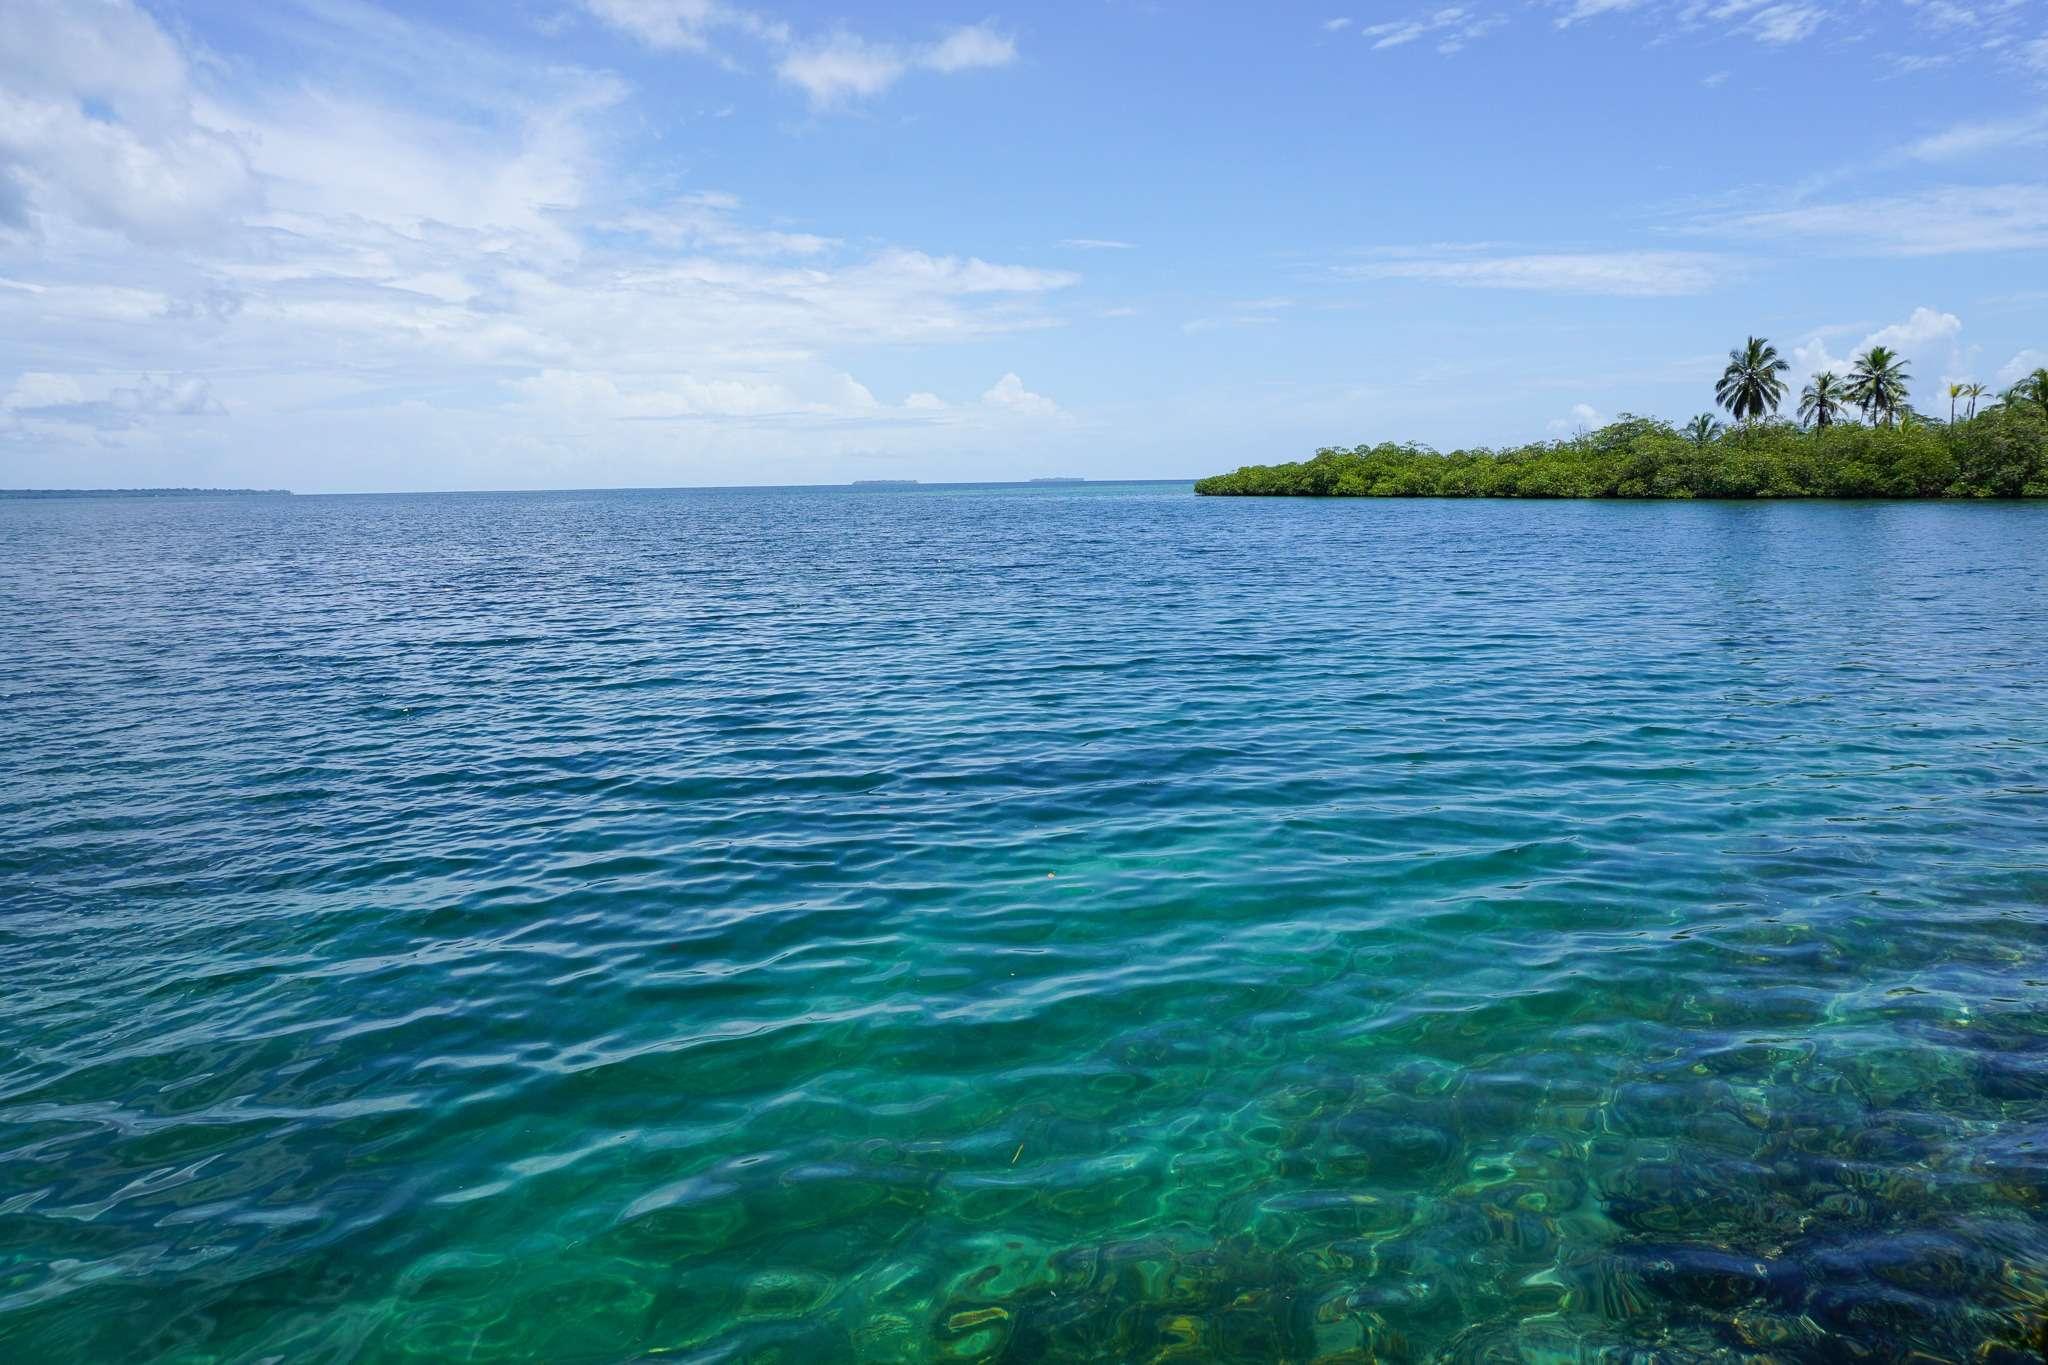 turquoise water in Bocas del Toro, Panama